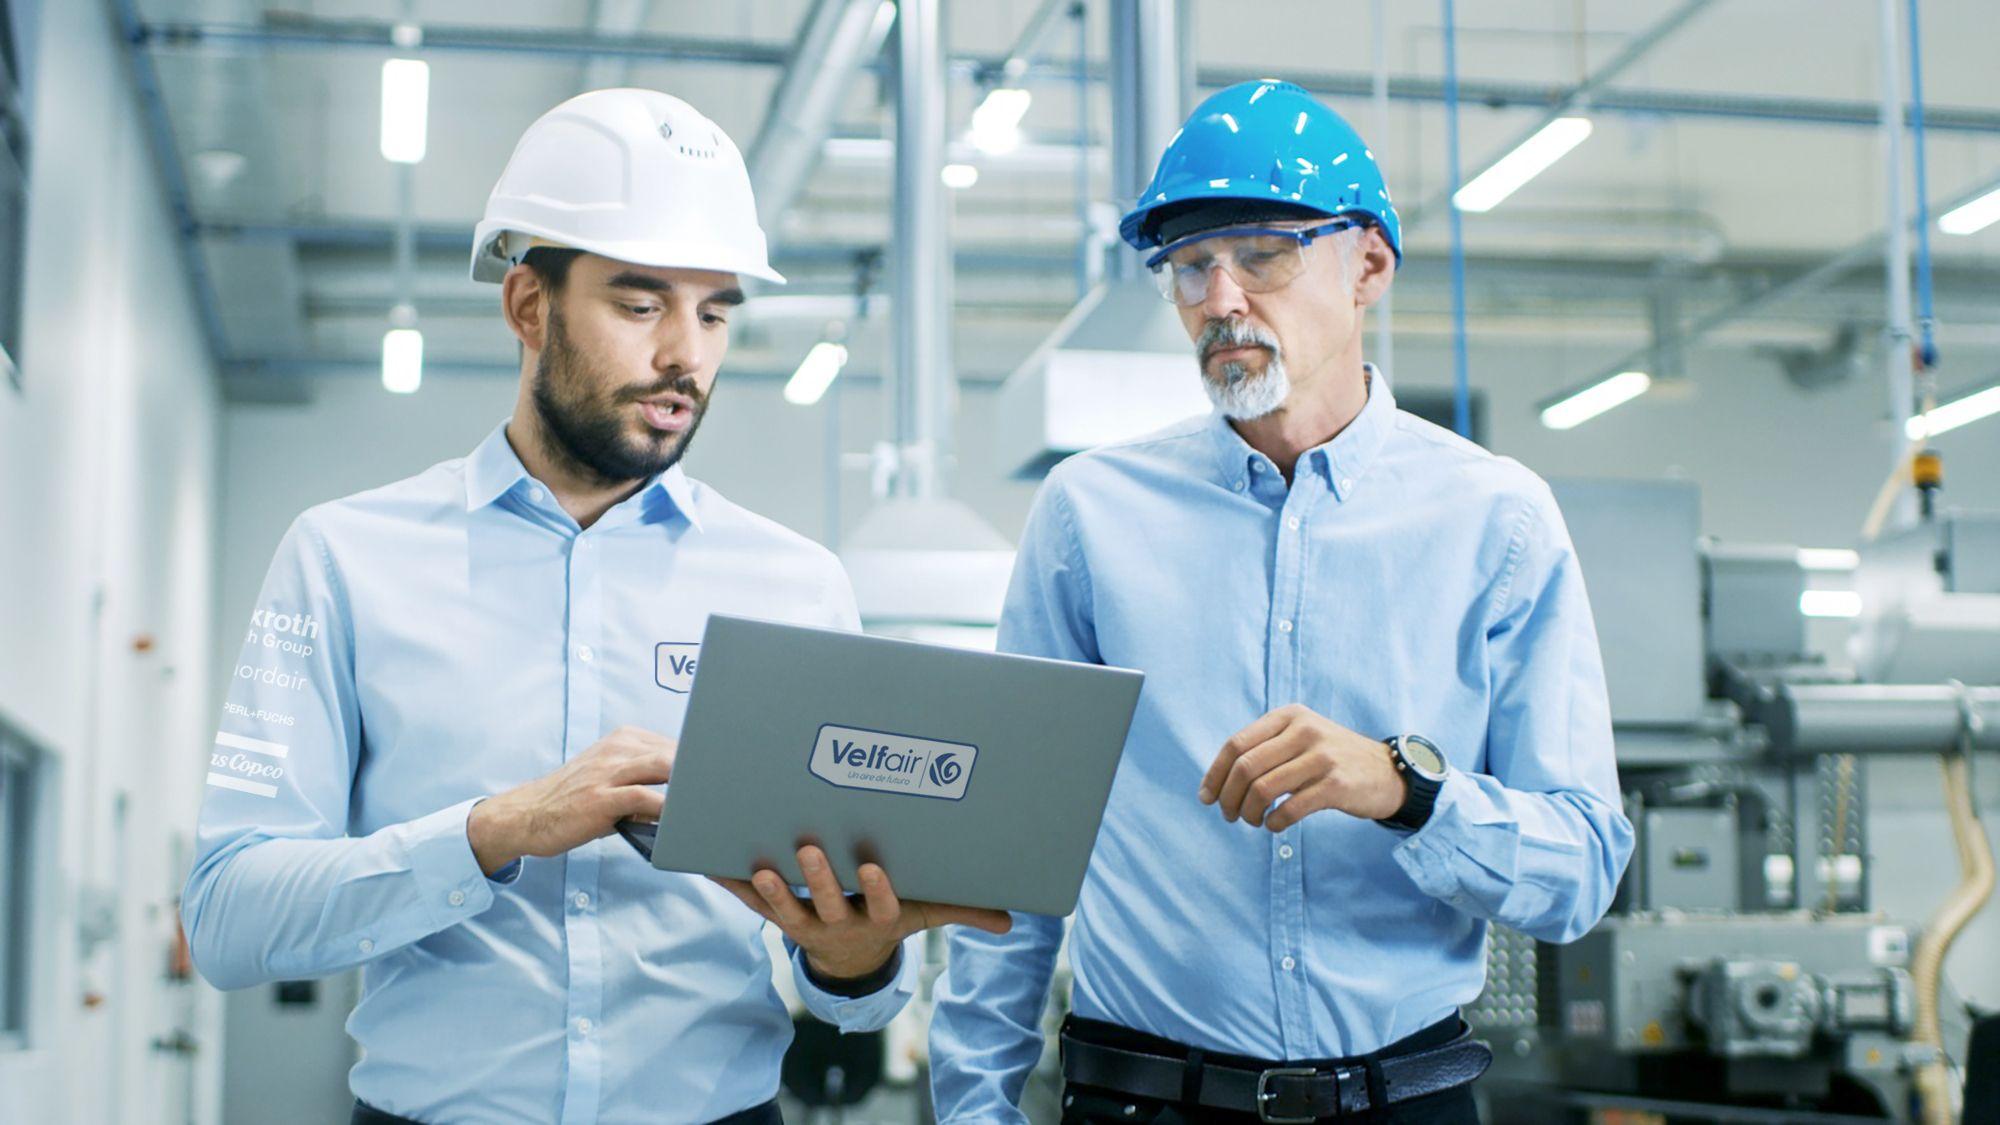 Velfair ofreciendo soluciones de Industria 4.0